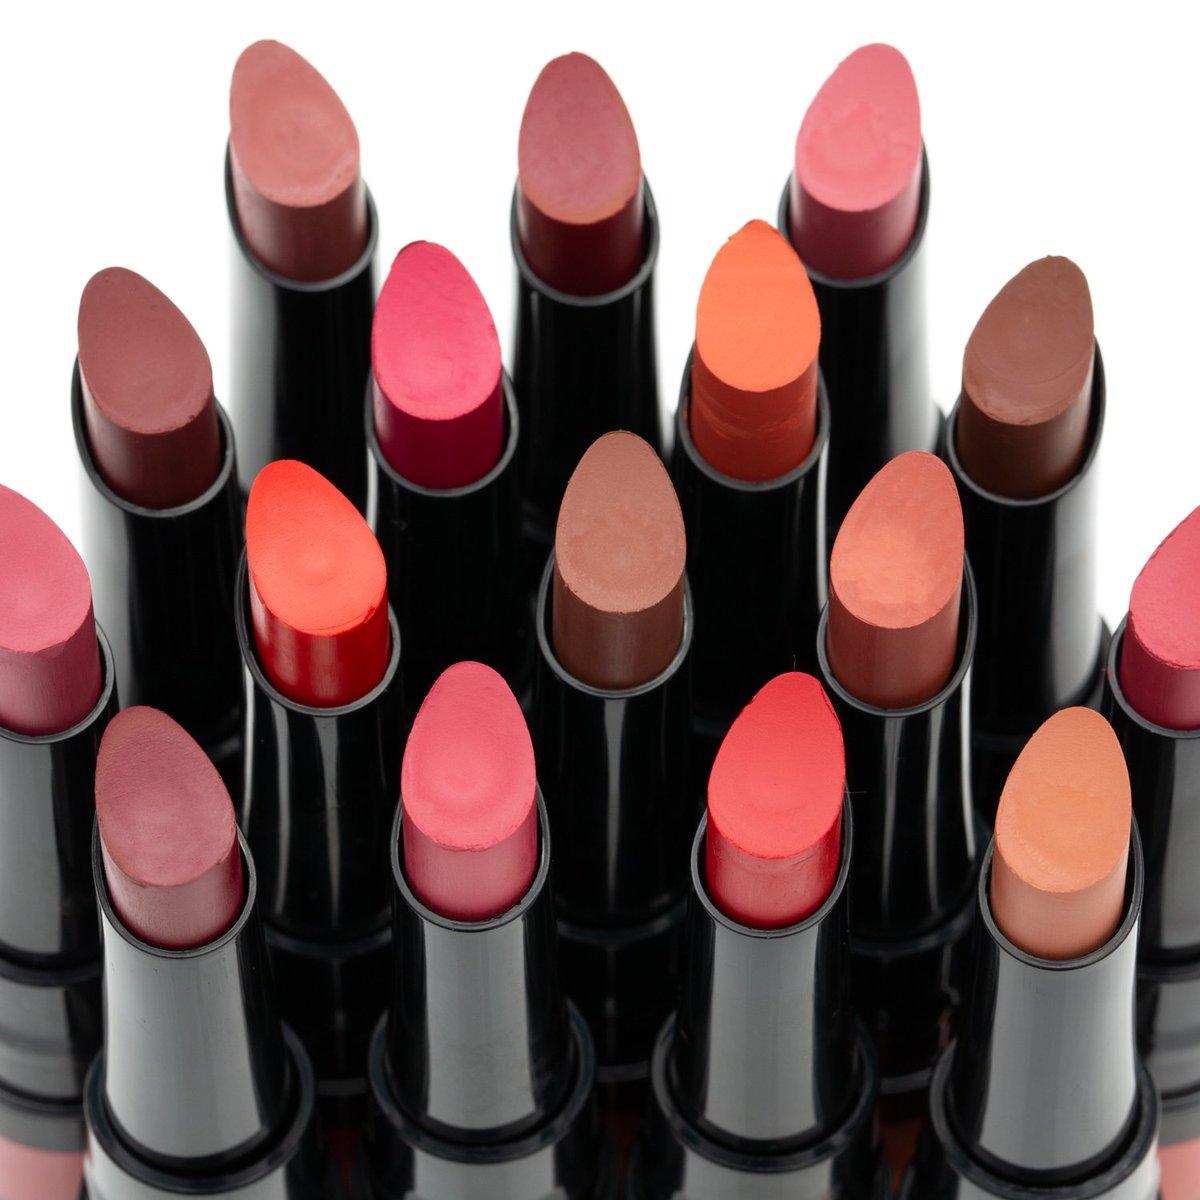 👄Treat your lips to the velvety texture of #VelvetTheLipstick 💄 available at @BootsUK  #RougeVelvetTheLipstick #LipstickLover #VelvetFinish #Lipstick #Bourjois #BourjoisParis https://t.co/zGYZt9aQjV